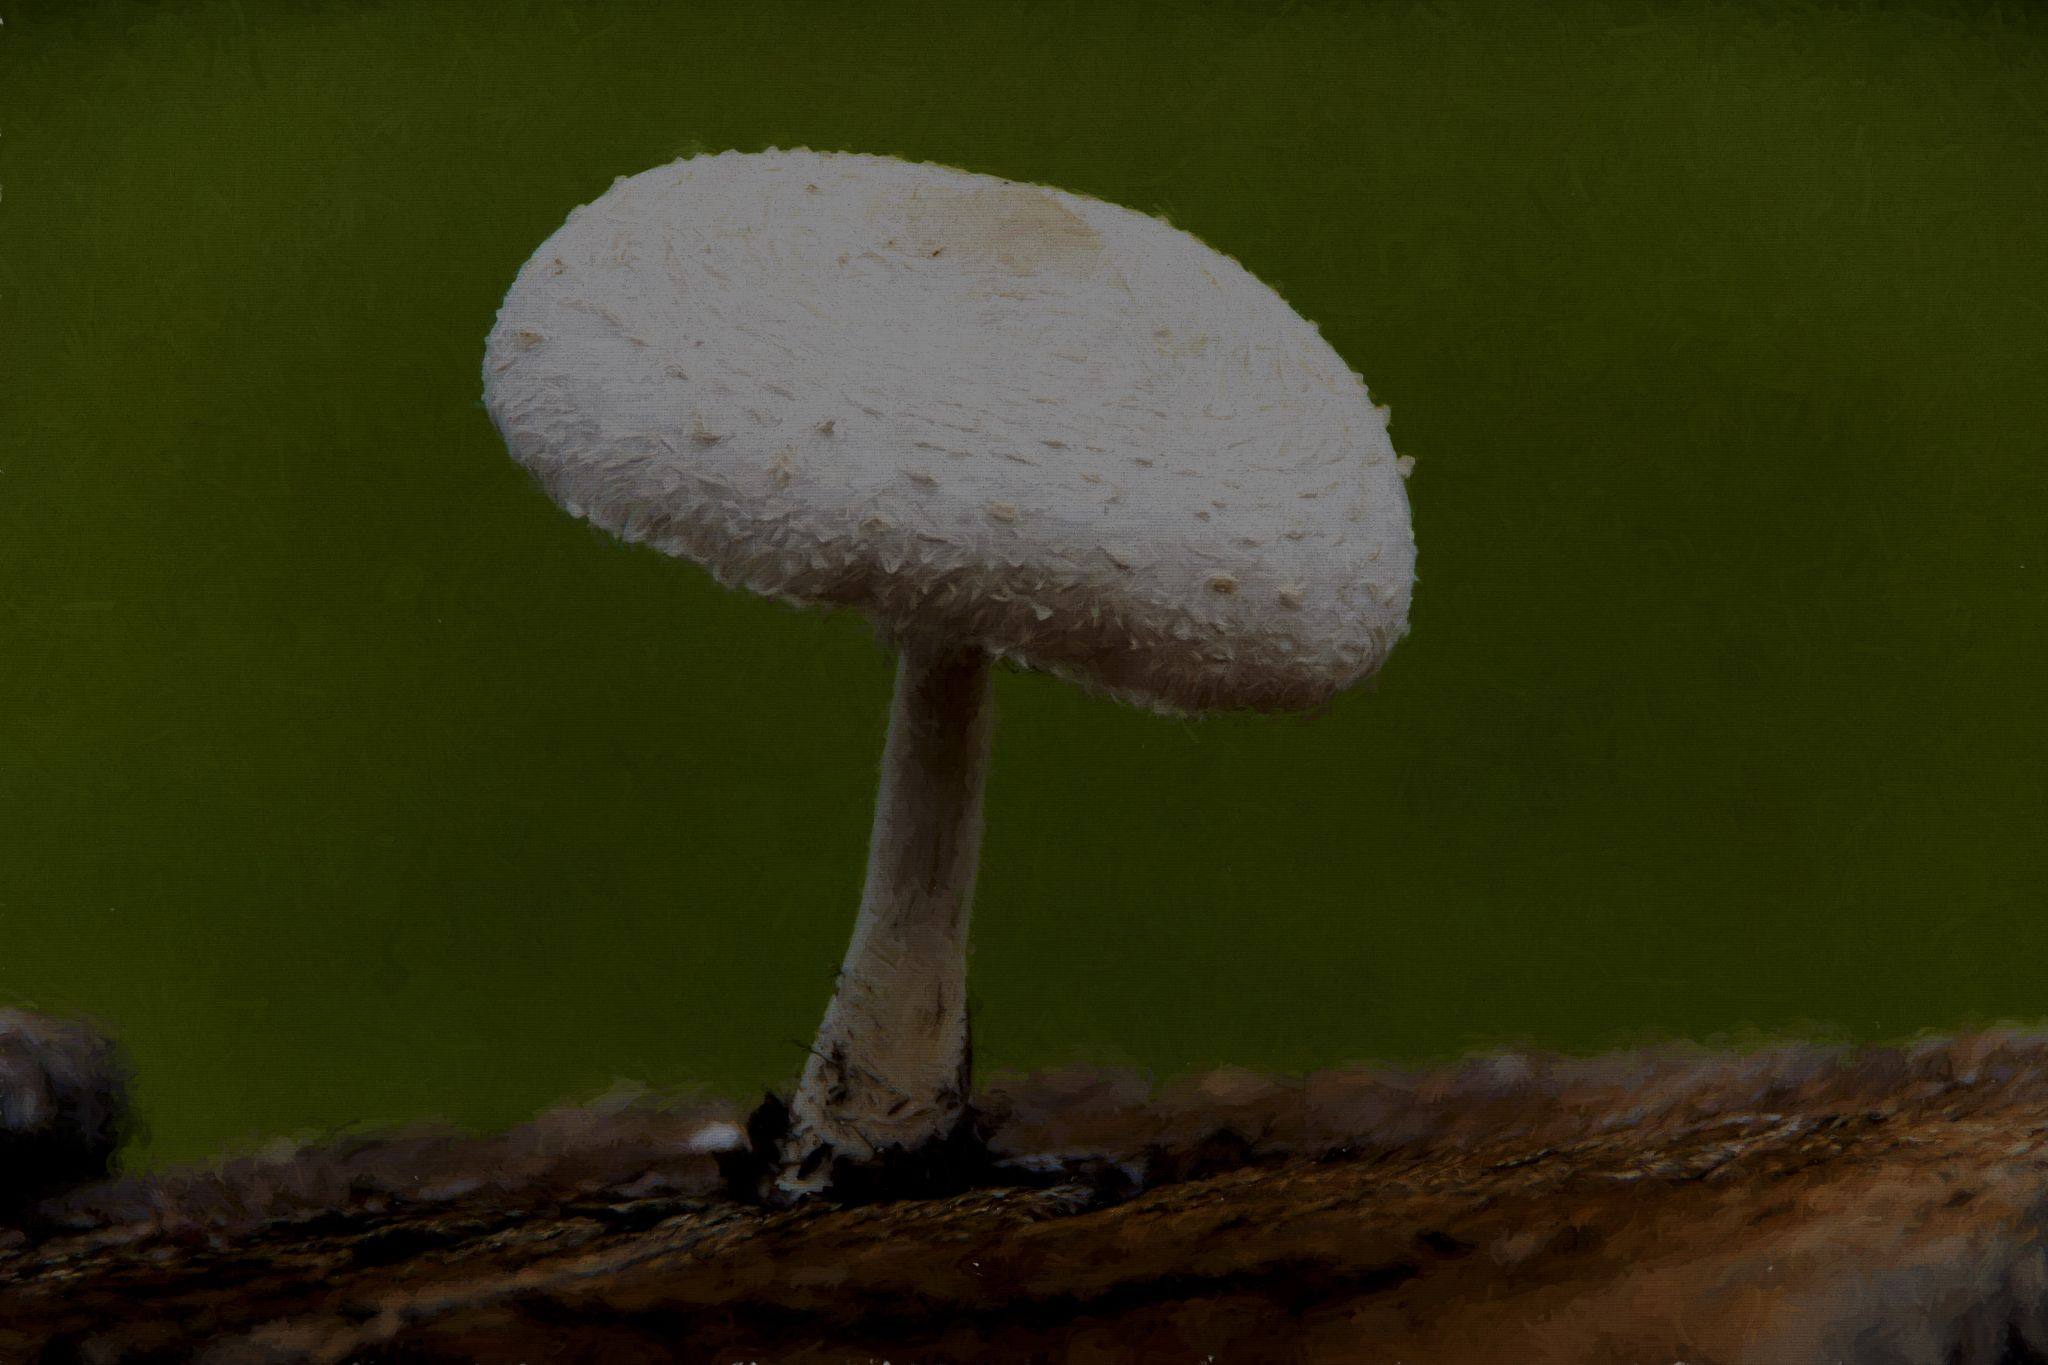 Mushroom by Dchester1001